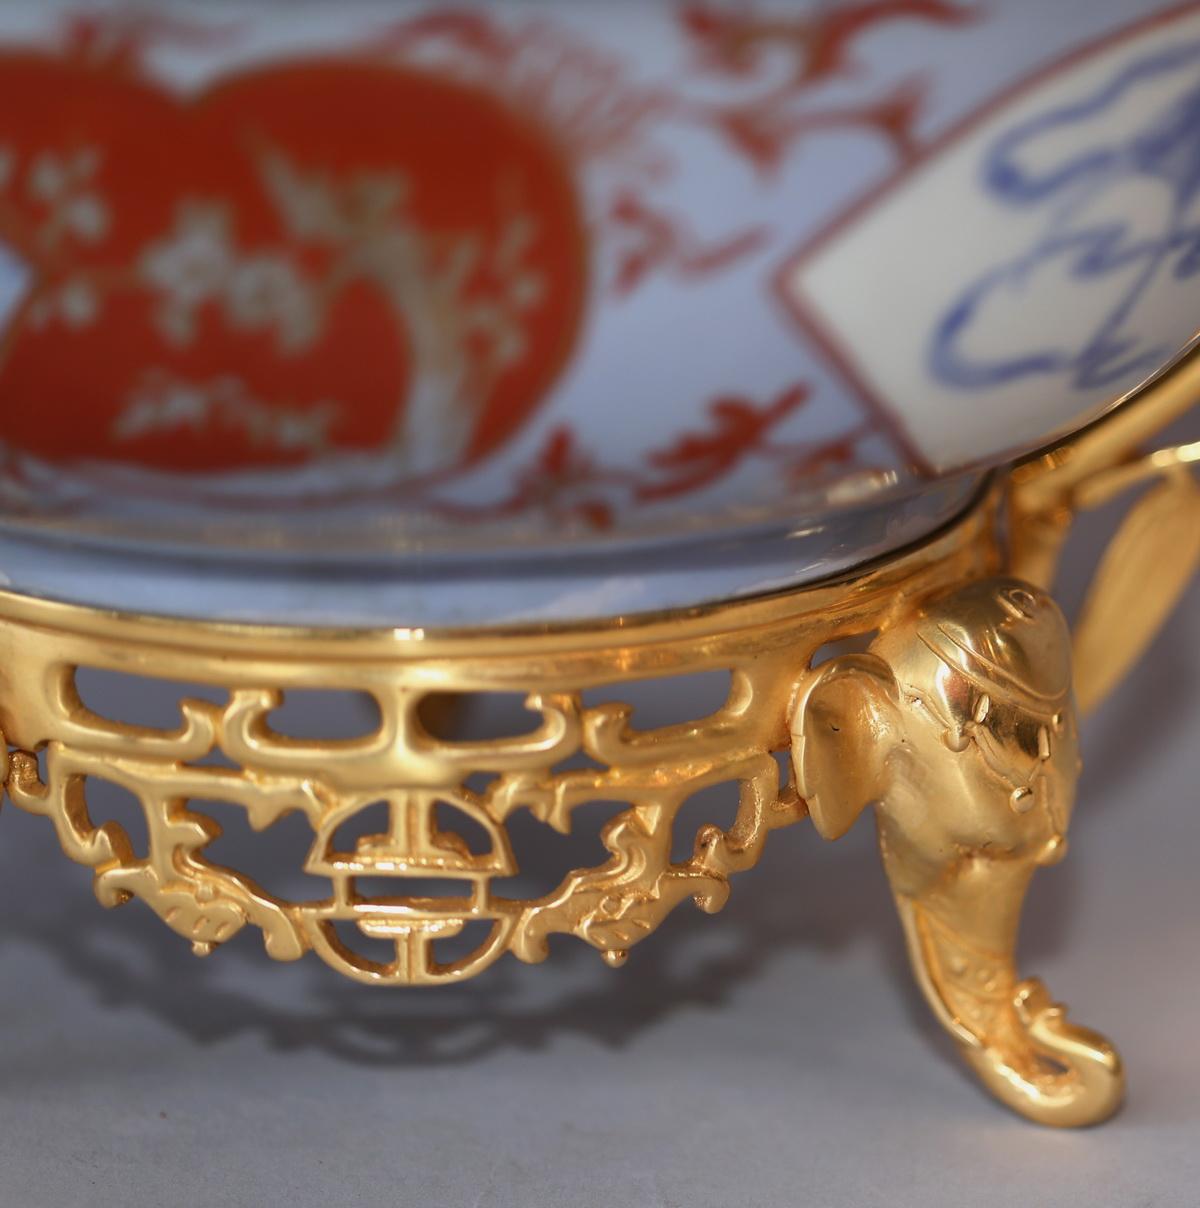 Porcelaine Imari monture bronze doré fin XIX